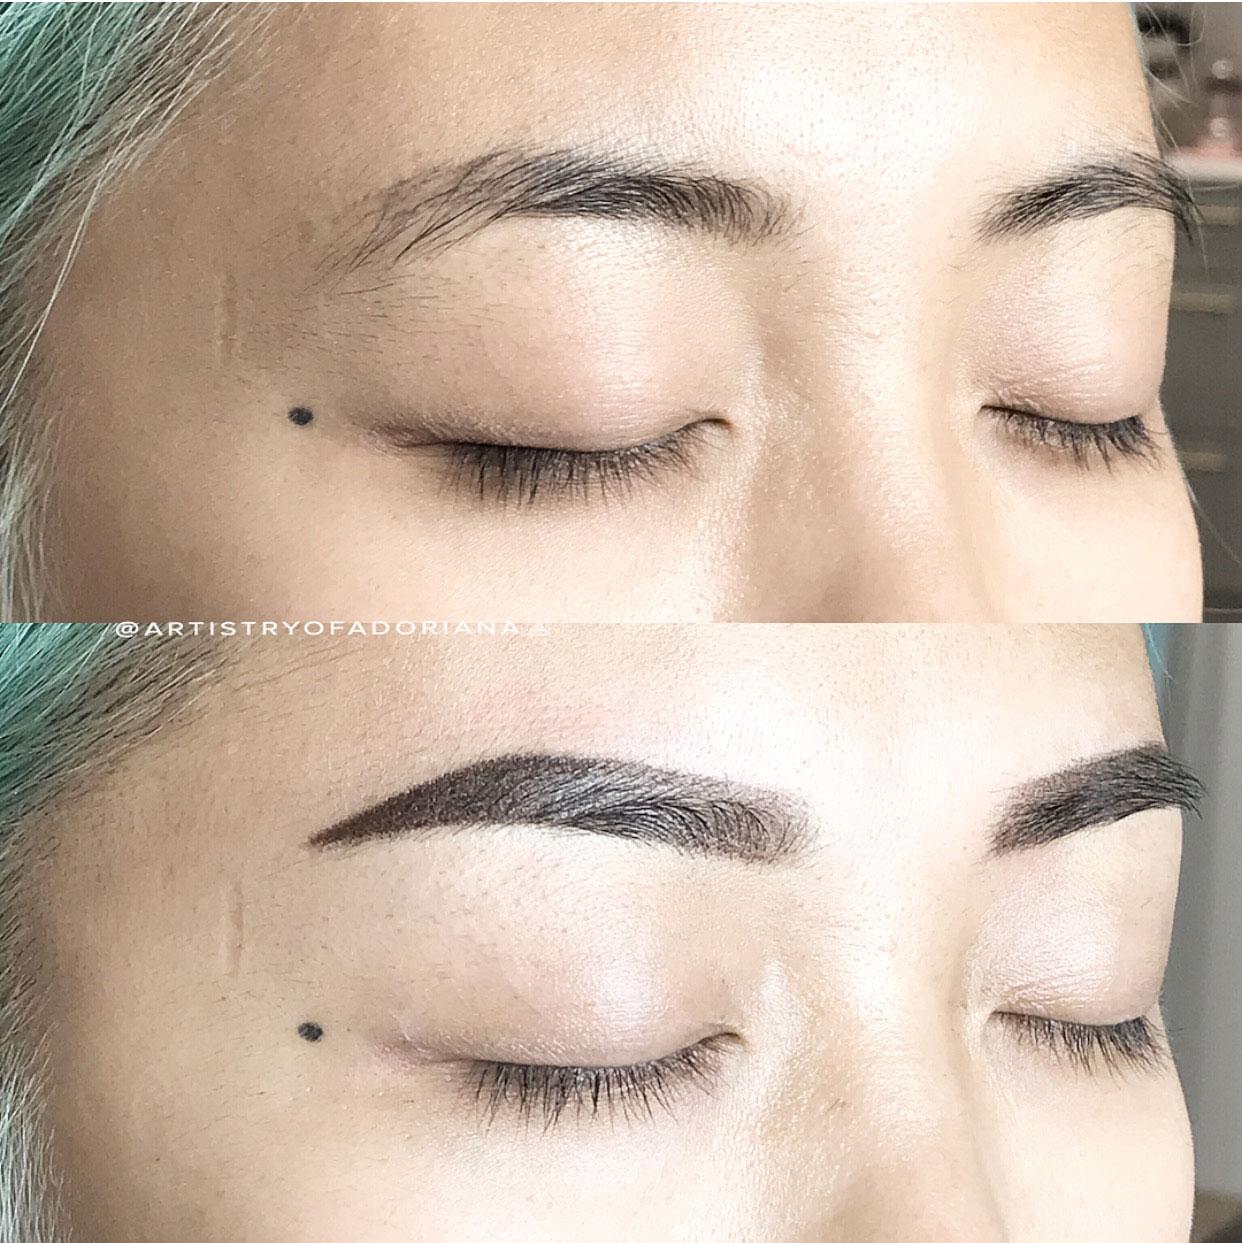 Vancouver Eyebrow: Microblading, Ombre Powder Brows